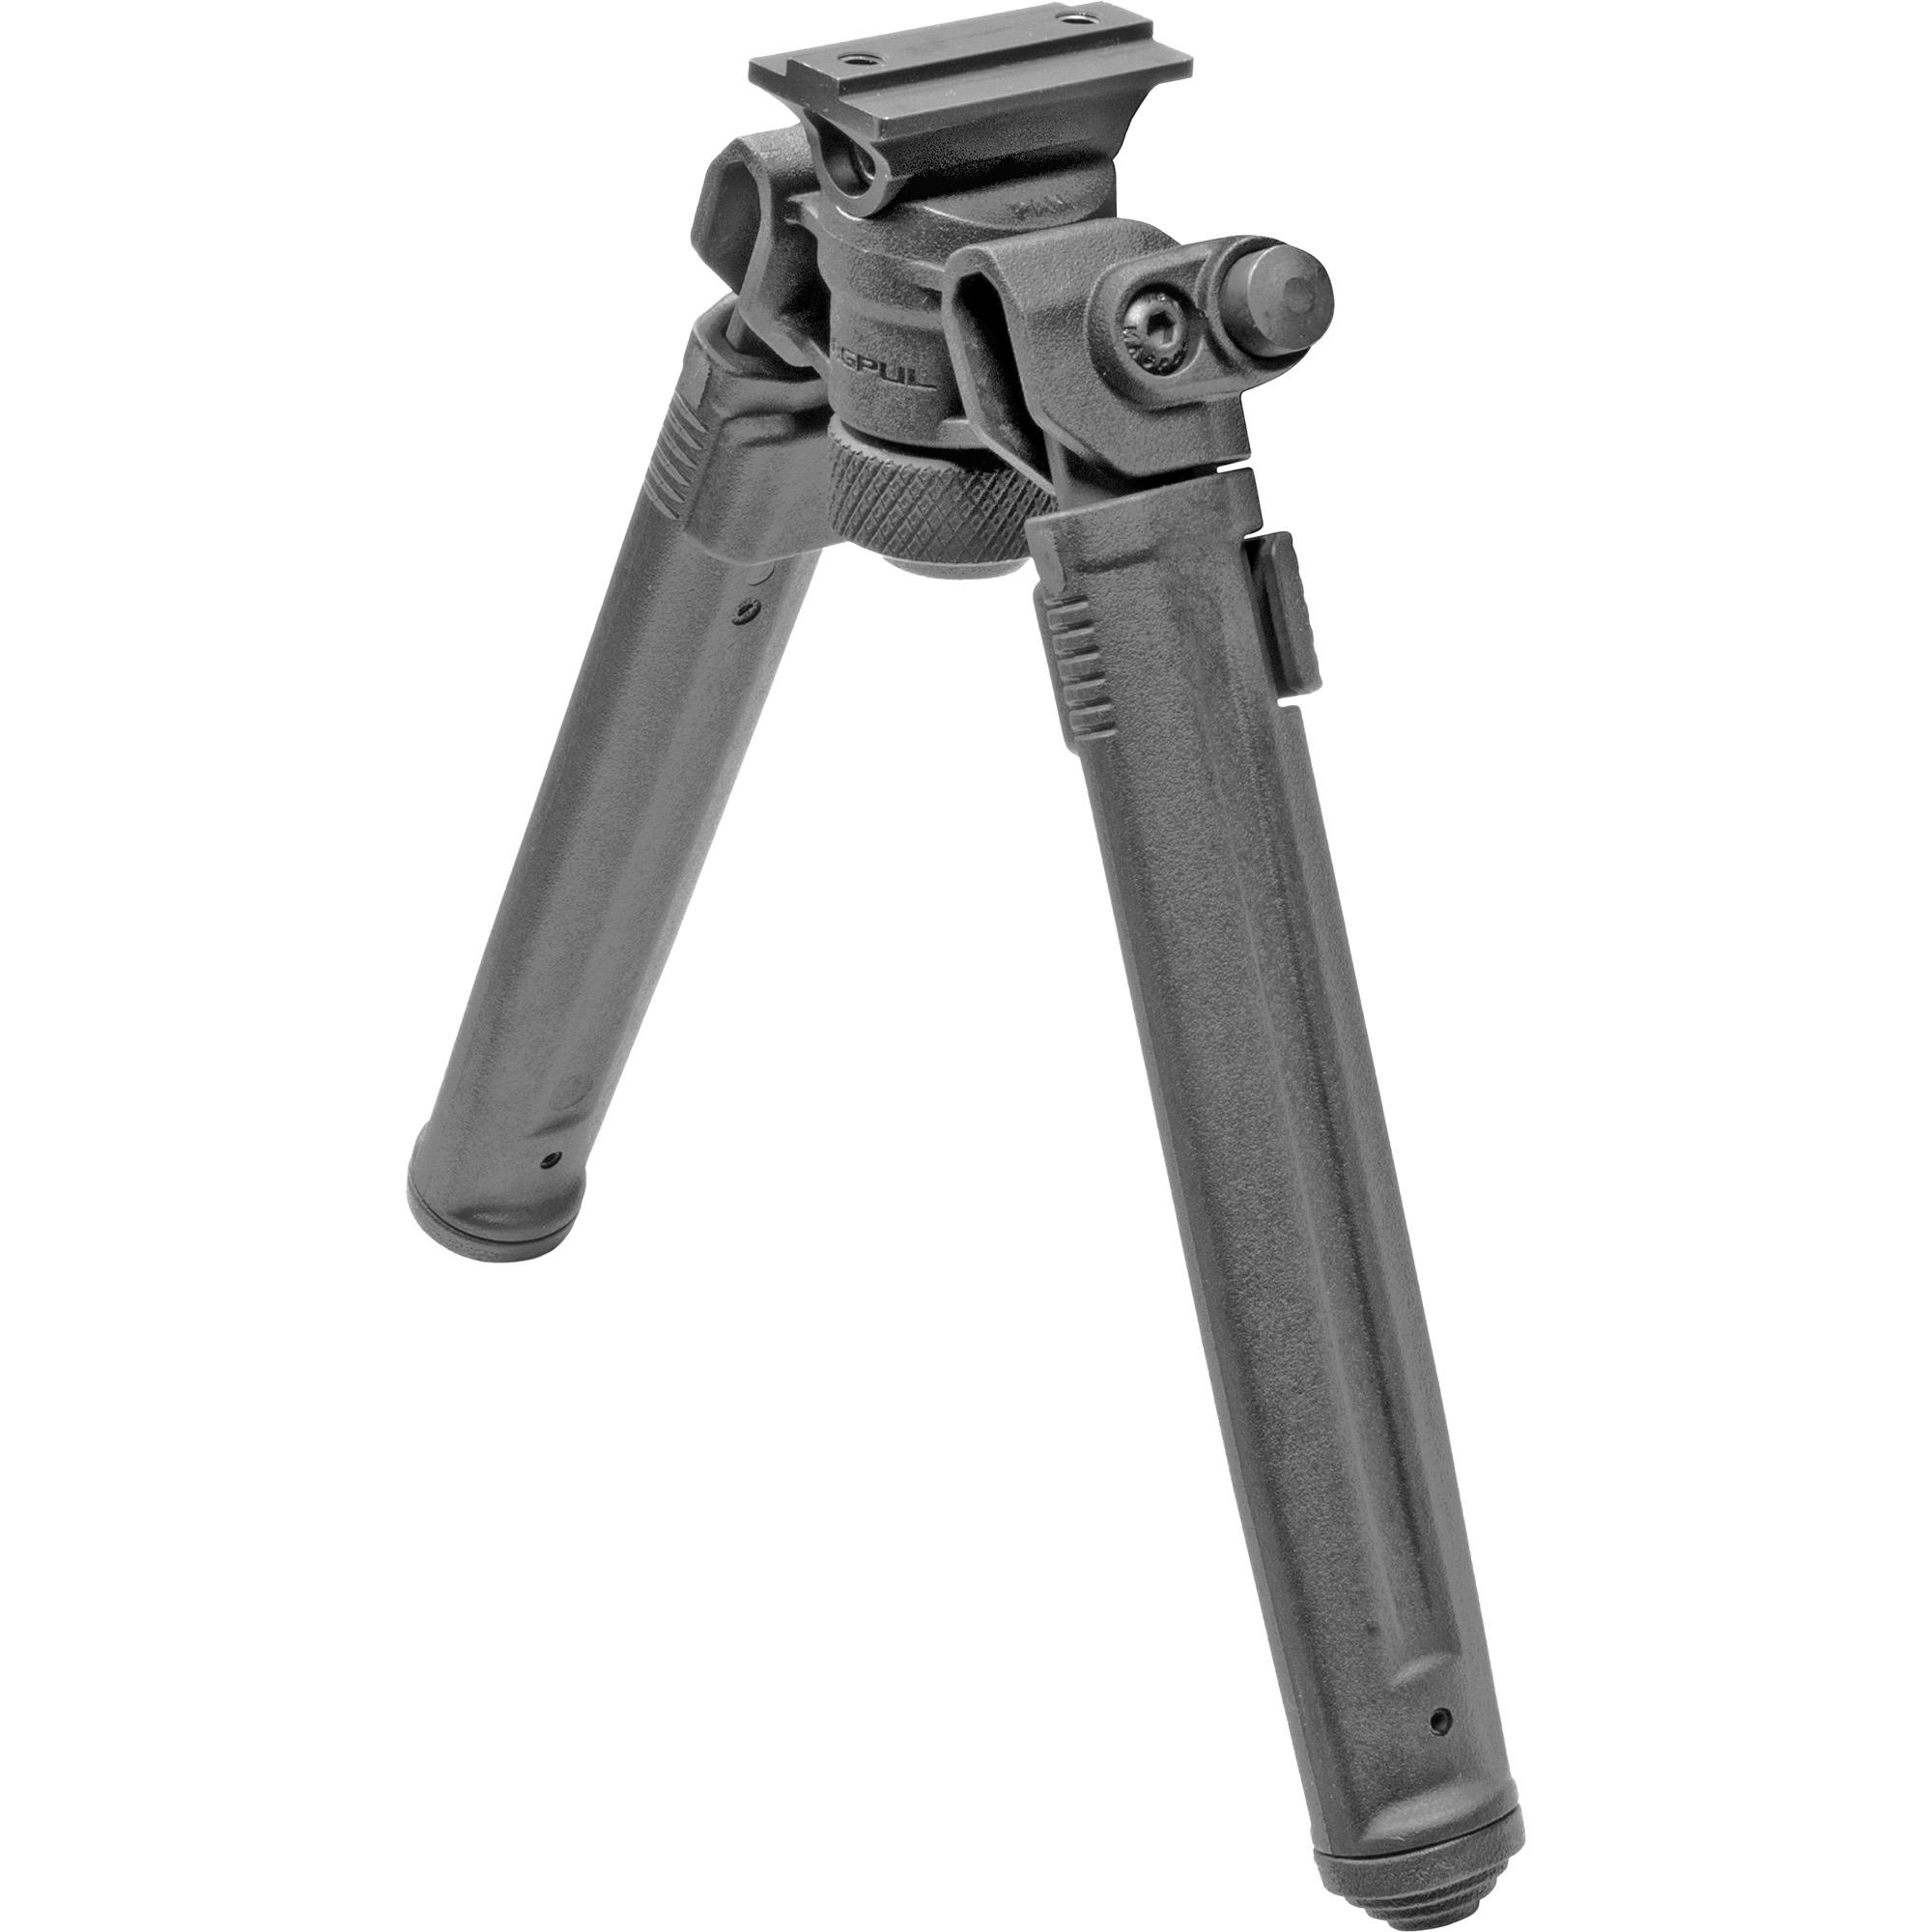 Magpul Bipod Arms 17s Blk